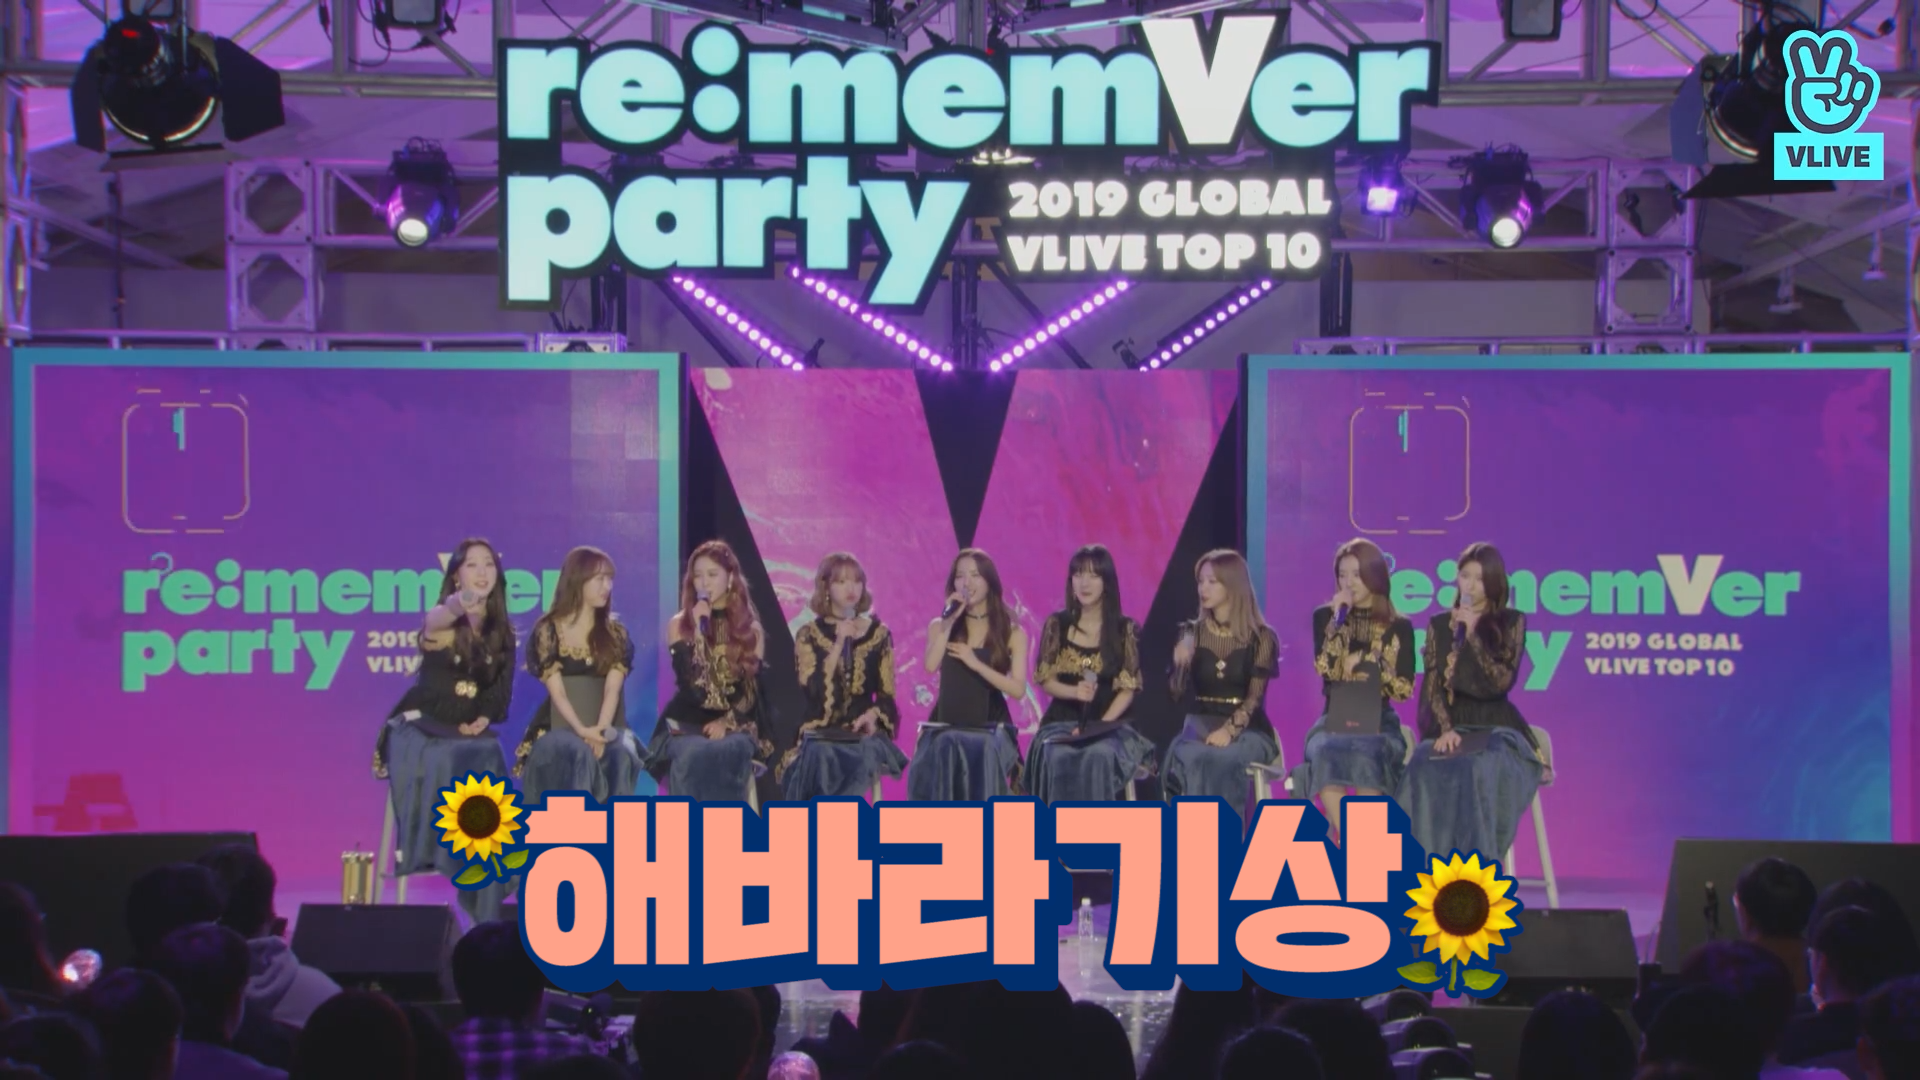 [WJSN] 나 웆바라기야! 우주소녀밖에 모르는 해바라기!🌻 (WJSN's awards for each other)